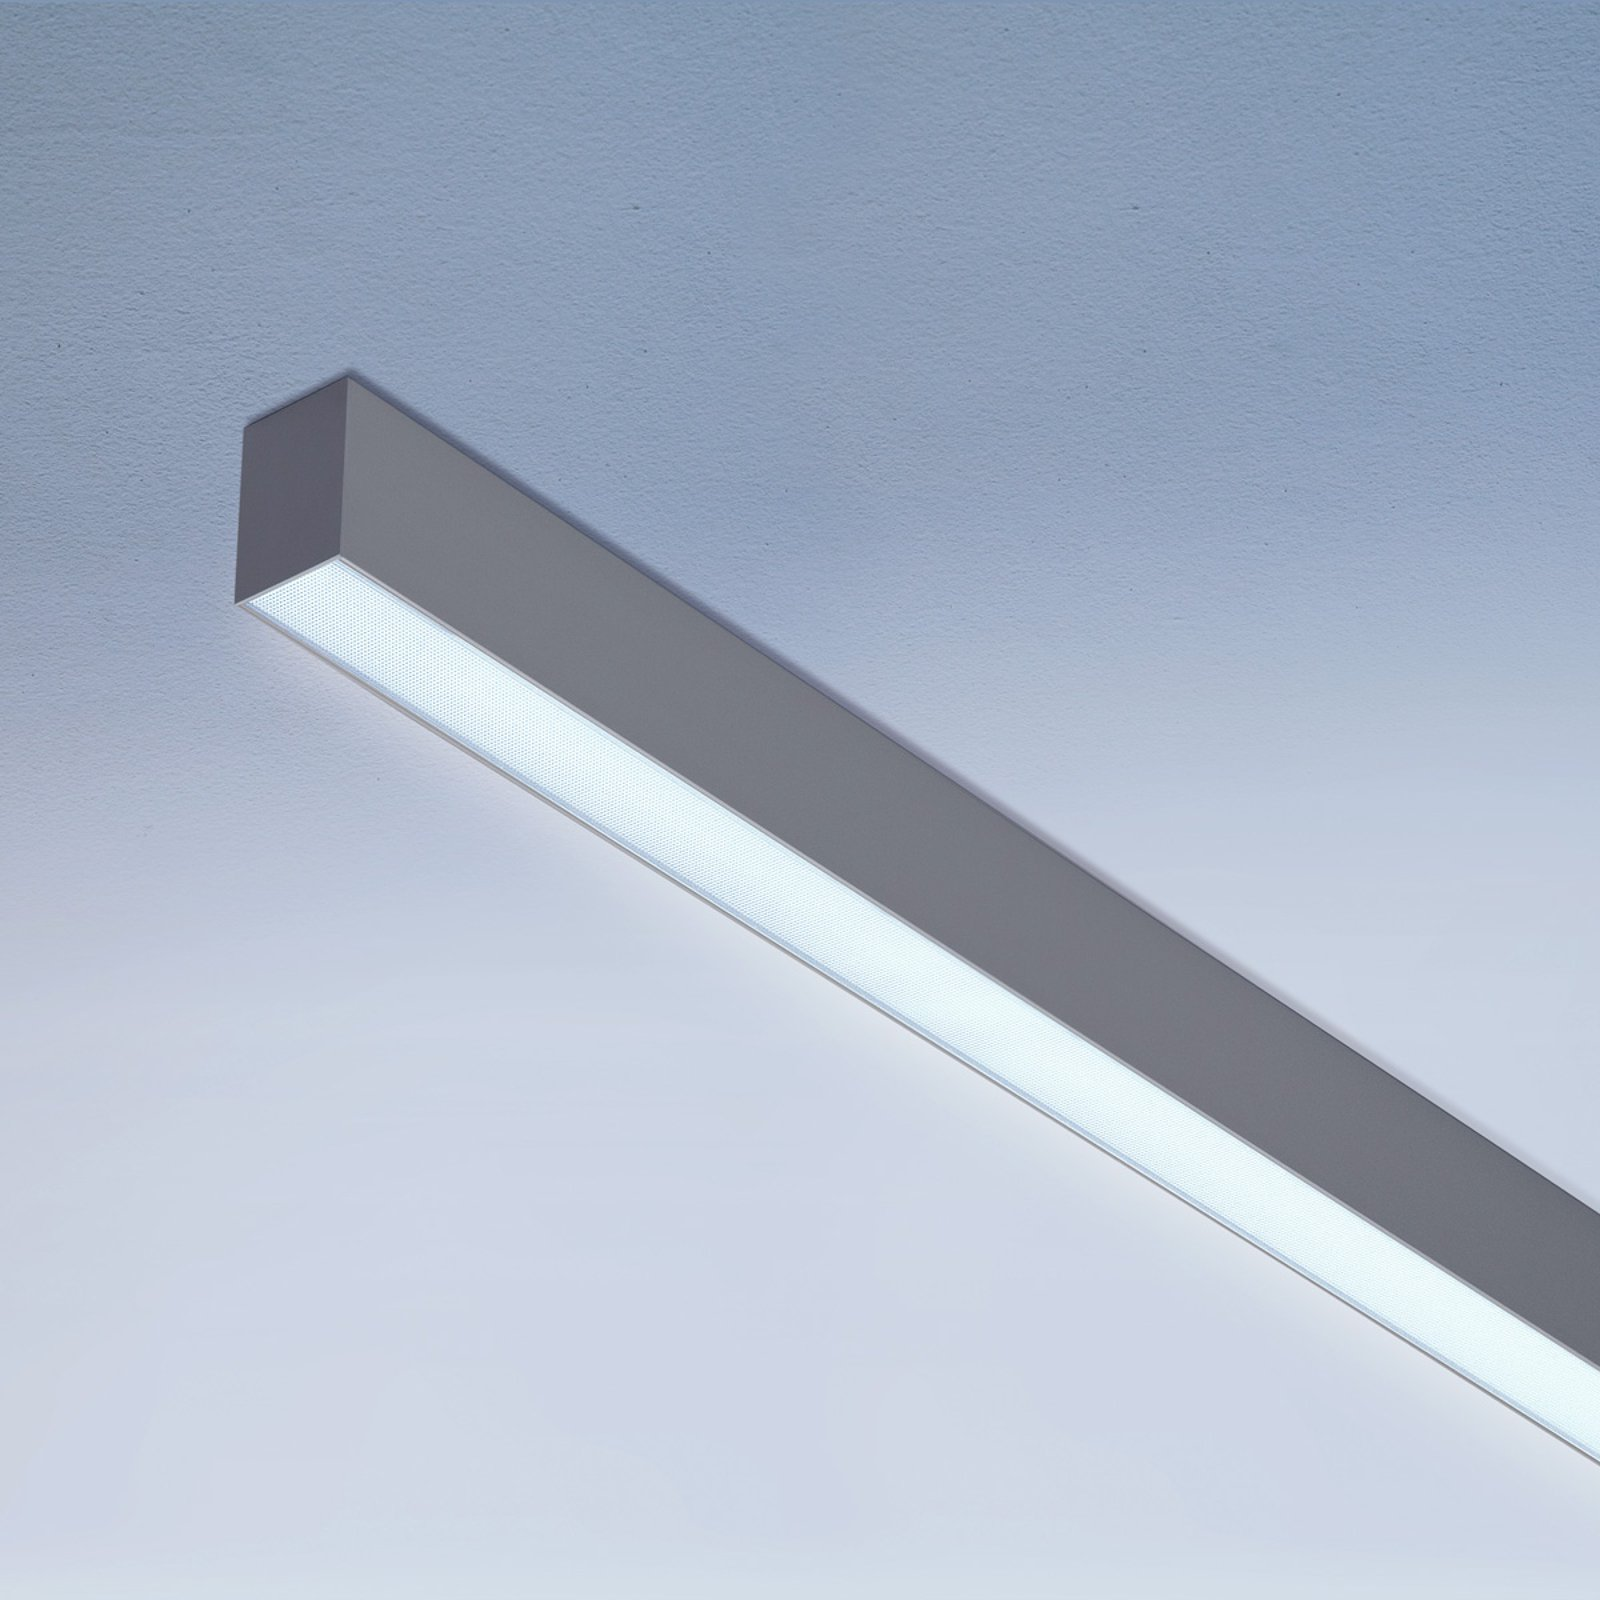 Medium Power Matric-A3 - LED-vegglampe 89 cm 24